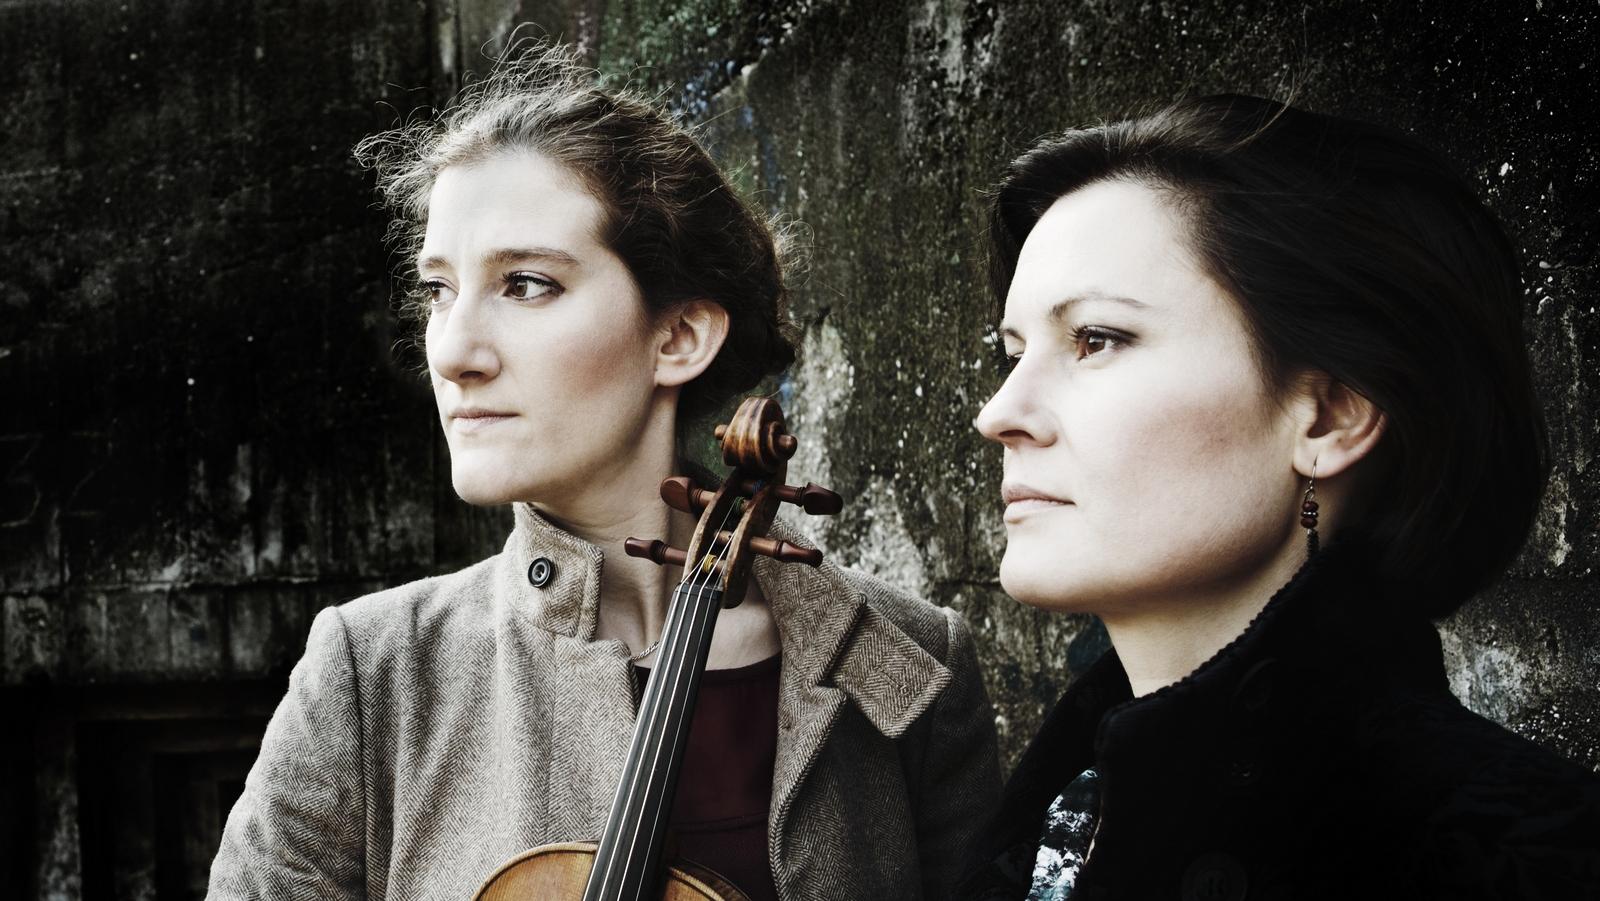 Maria Milstein (viool) en Hanna Shybaeva (piano)